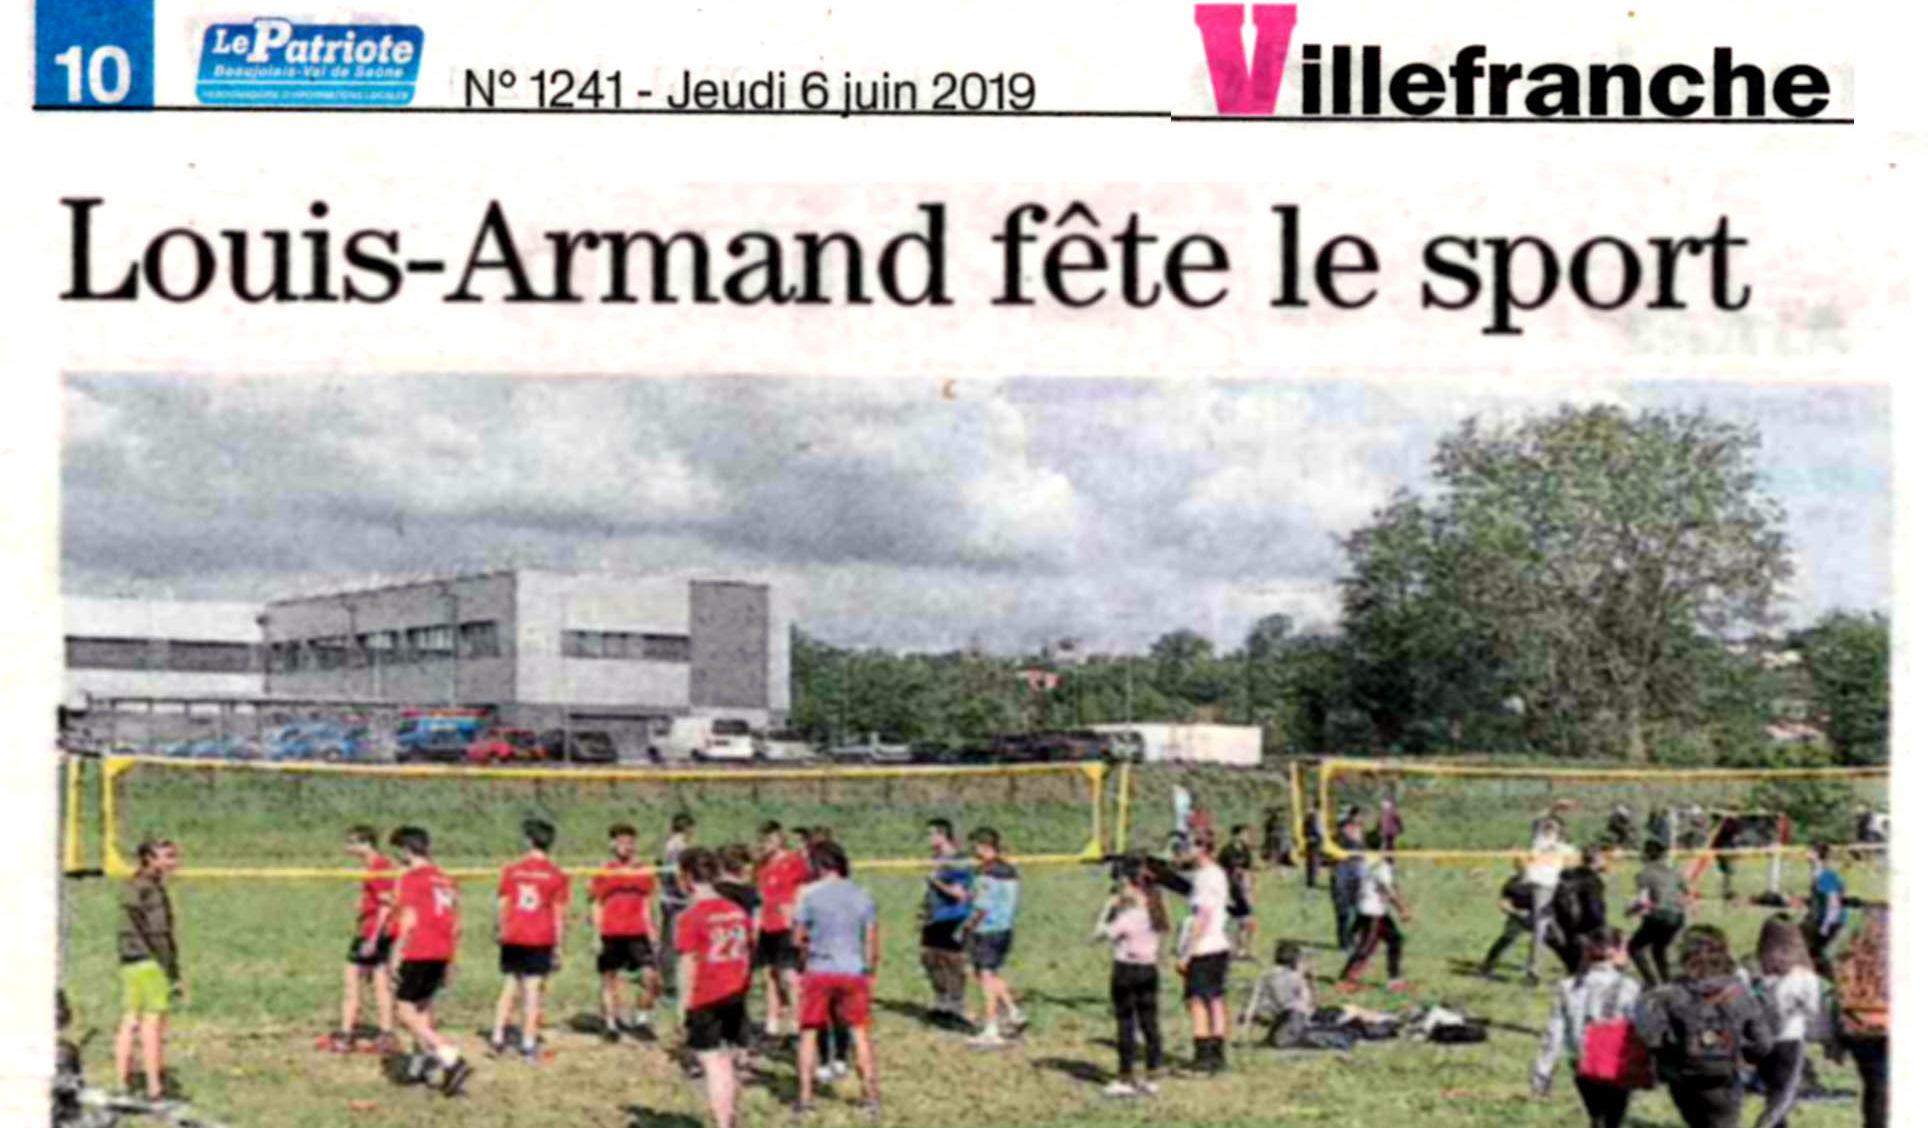 Article Patriote 20190606 Fete du sport.jpg